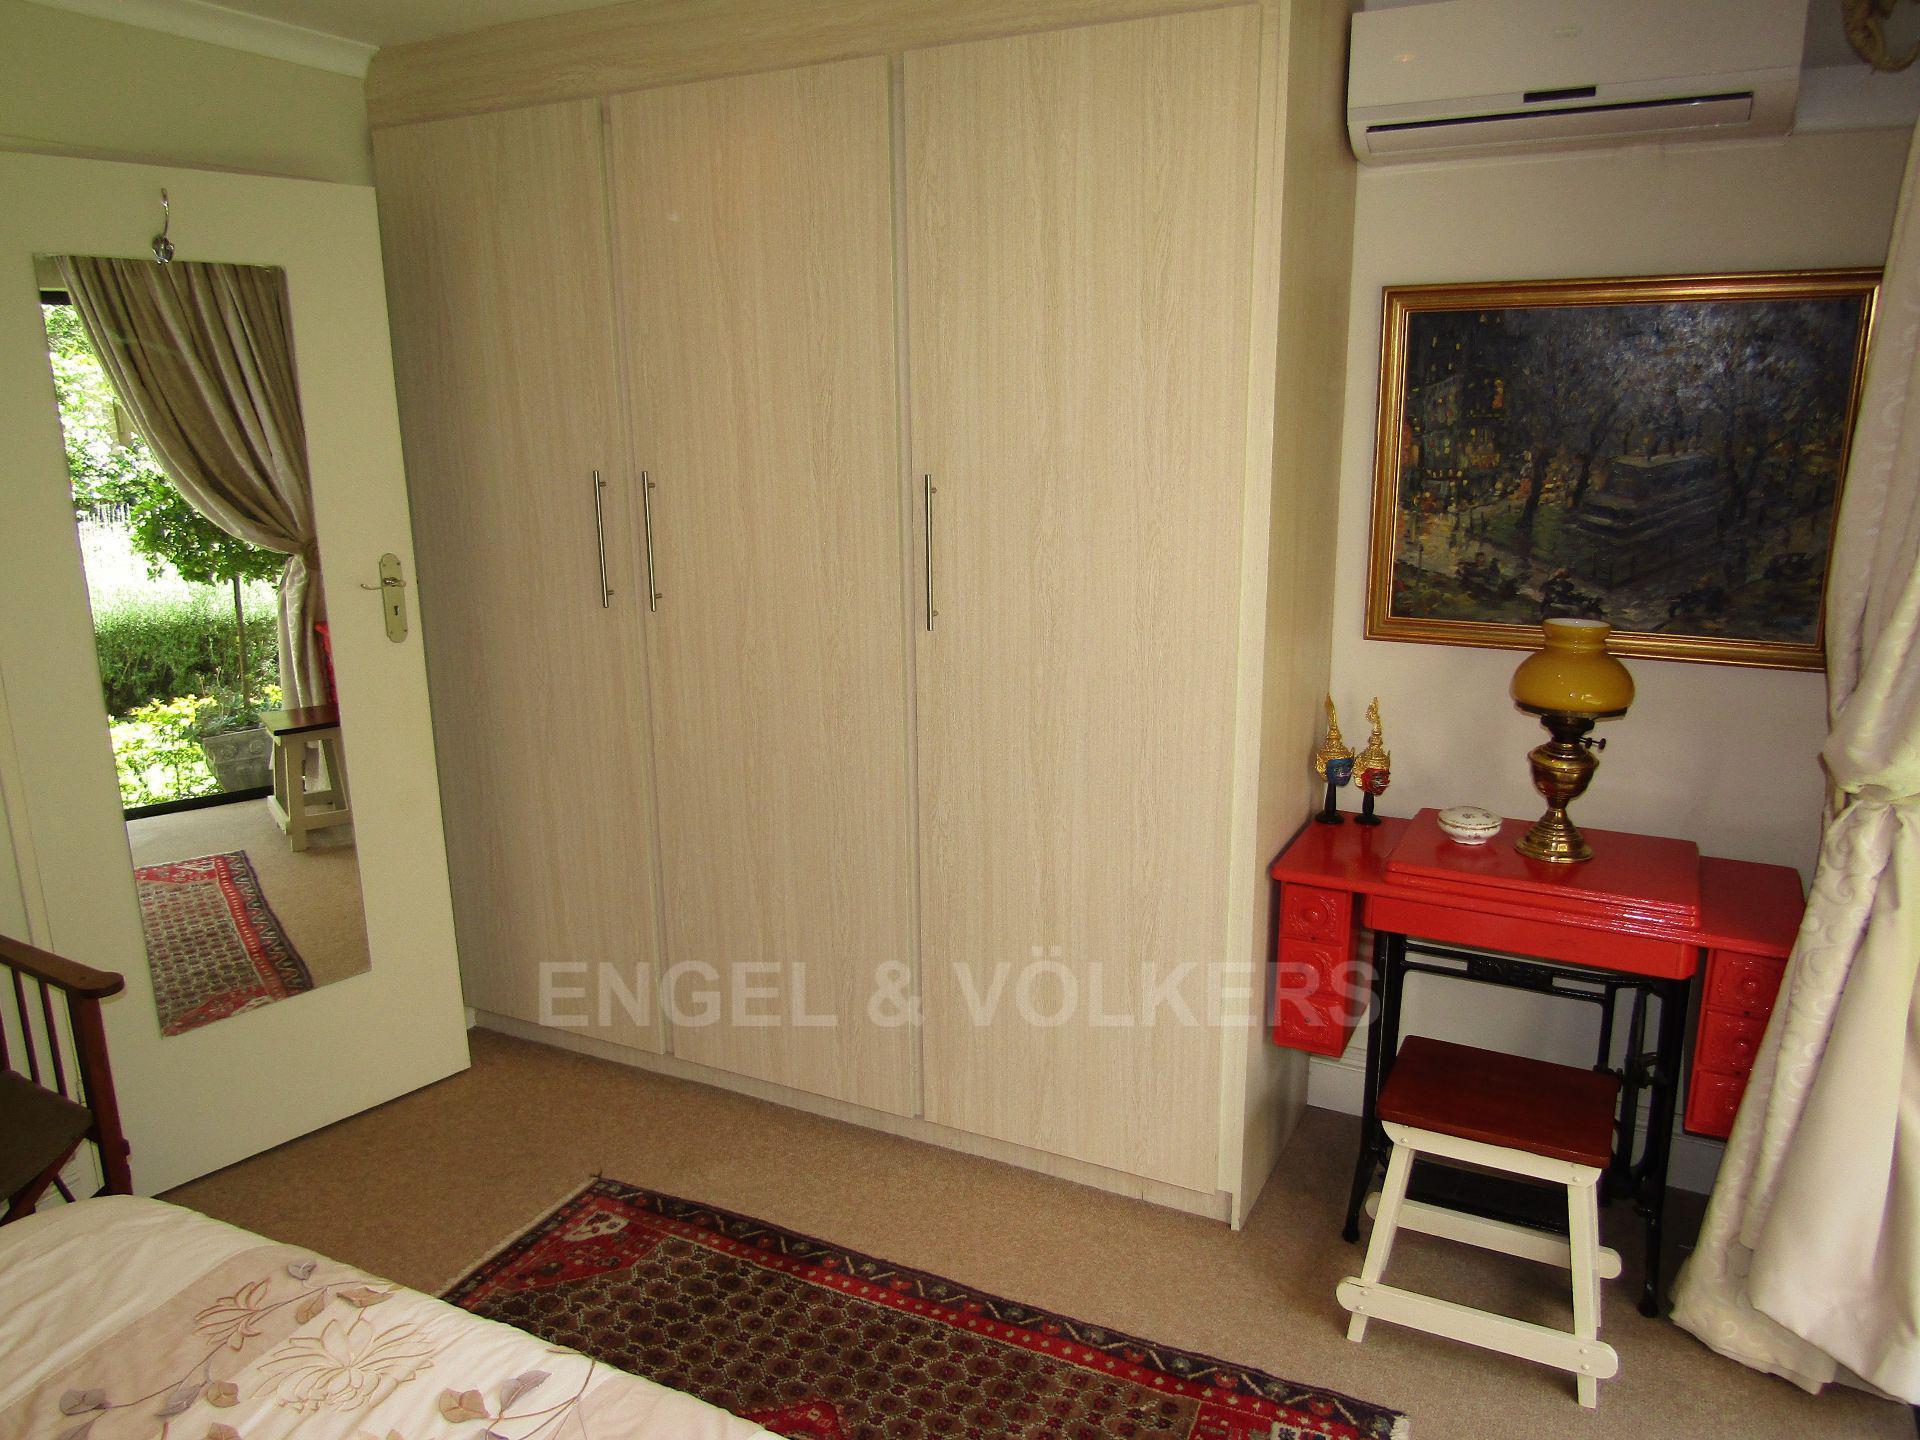 Heilige Akker property for sale. Ref No: 13555391. Picture no 18